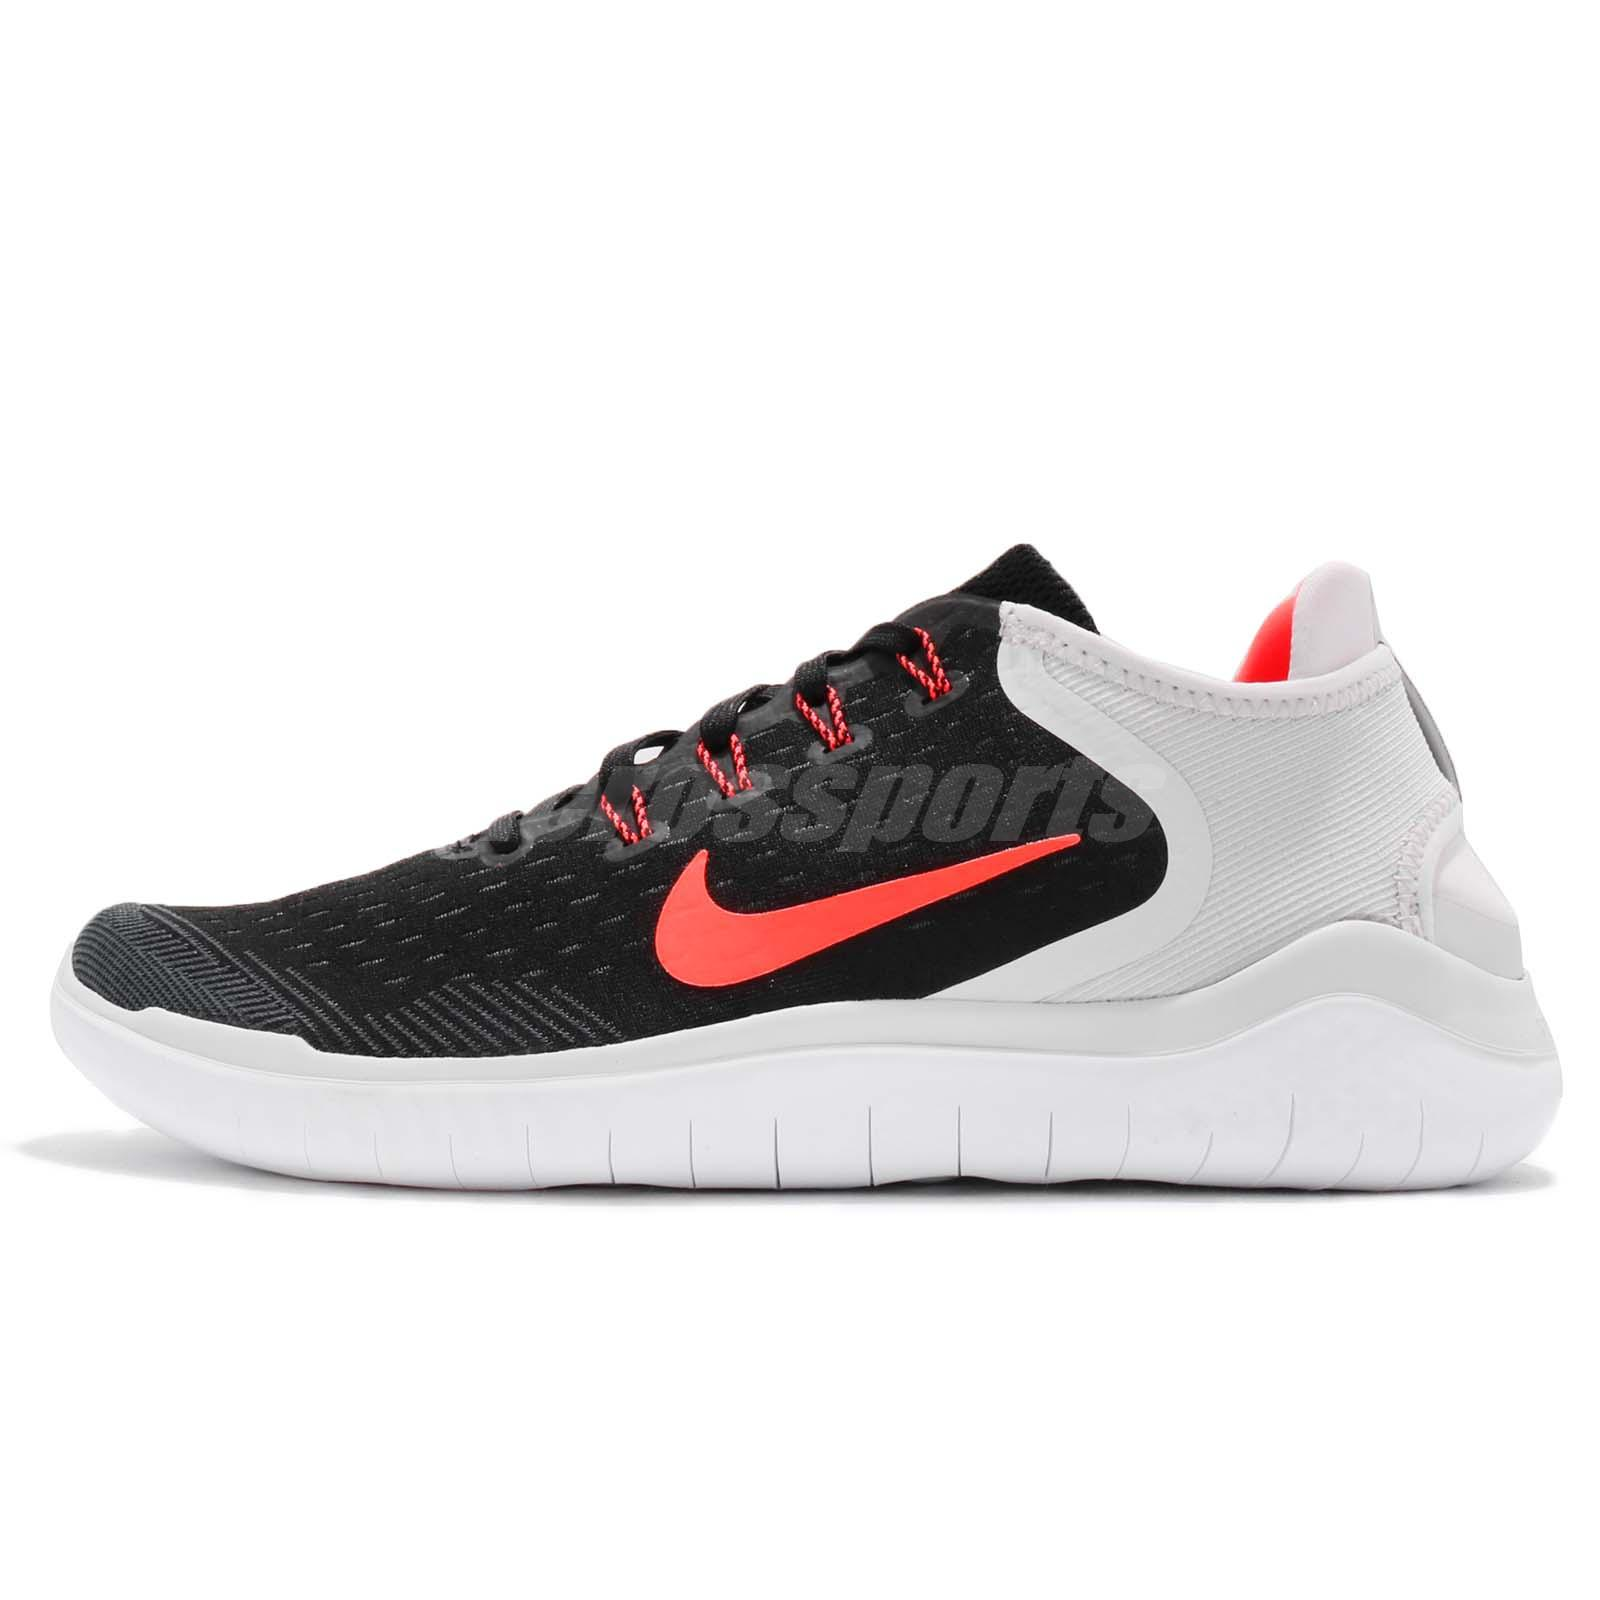 Nike Free RN 2018 Black Total Crimson Men Running Shoes Sneakers 942836-005